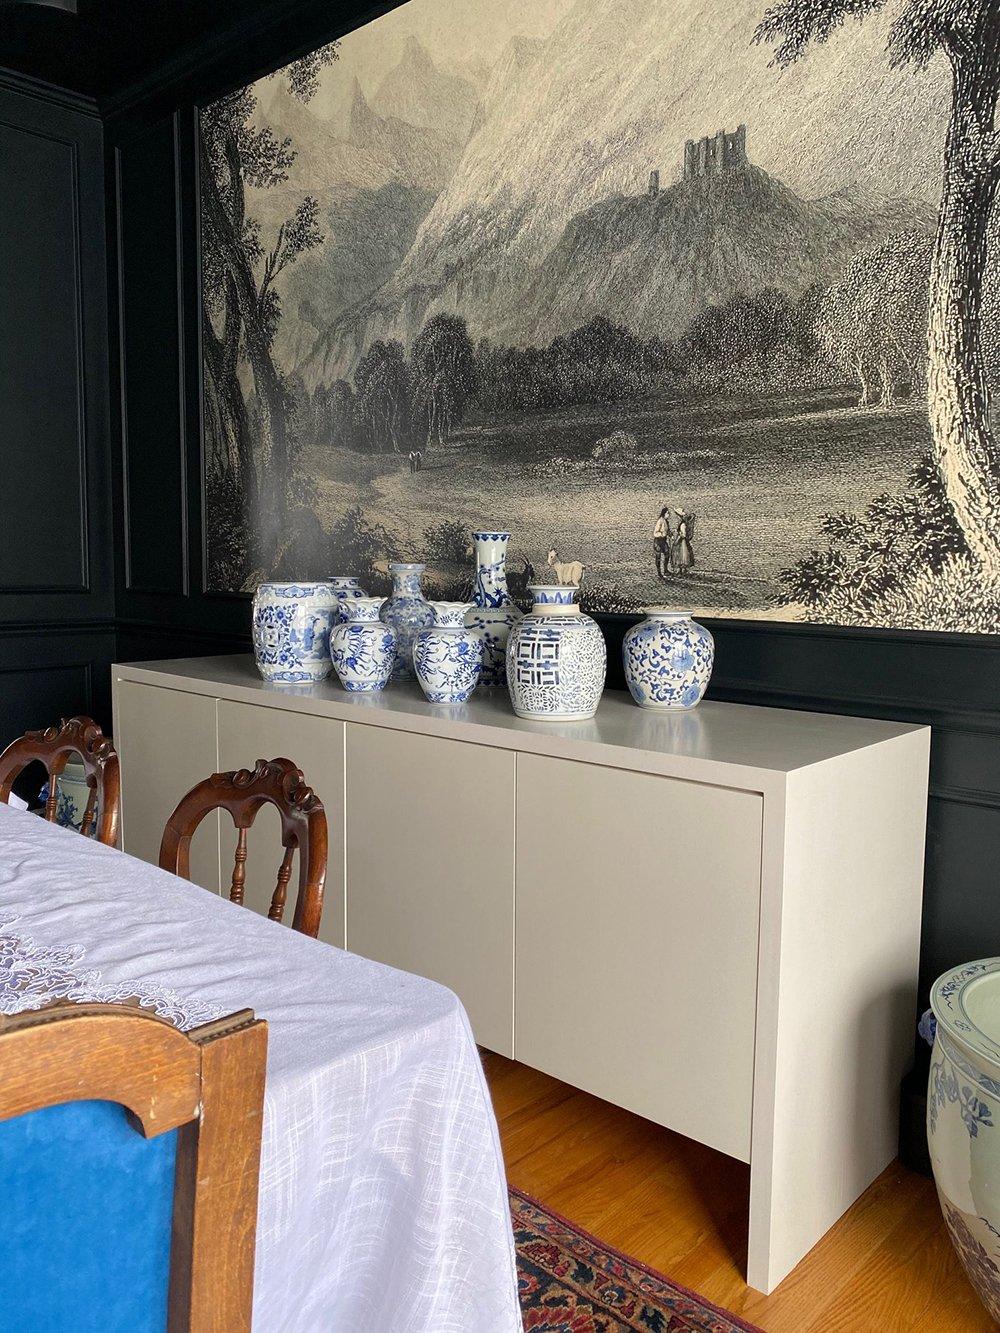 Best of Etsy : Vintage Blue & White Porcelain - roomfortuesday.com